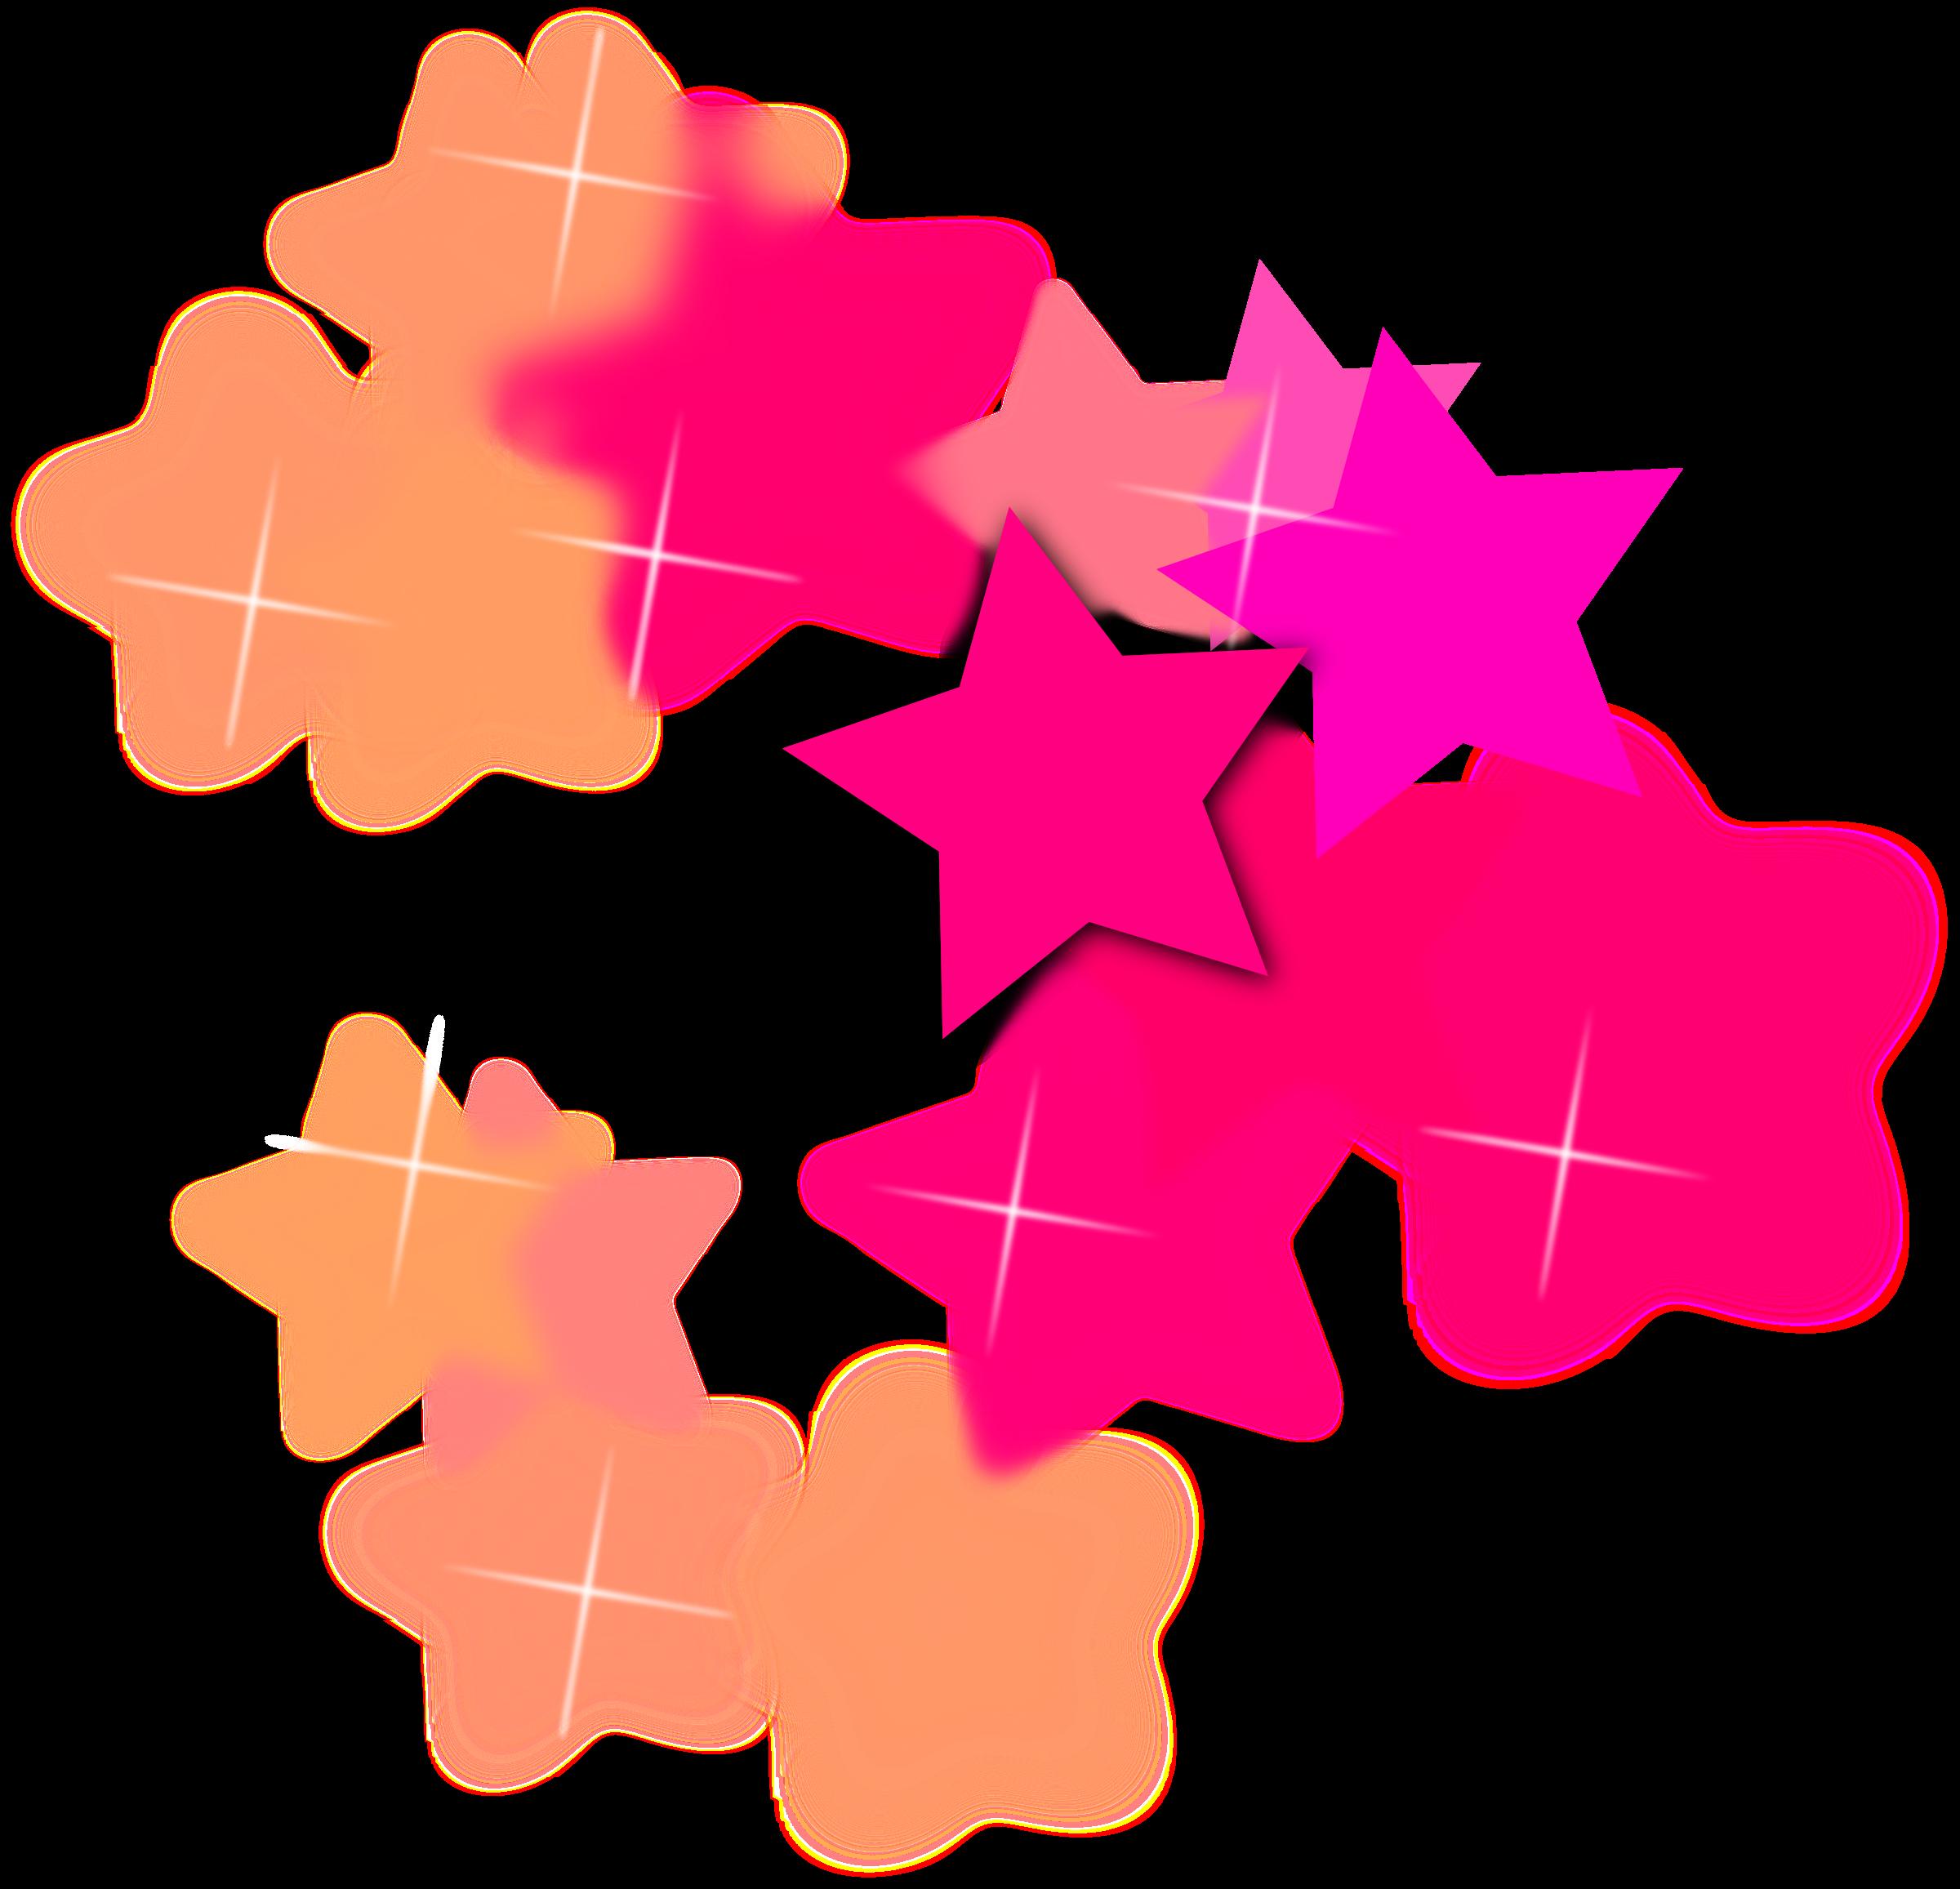 Flourish clipart royalty free. Star big image png